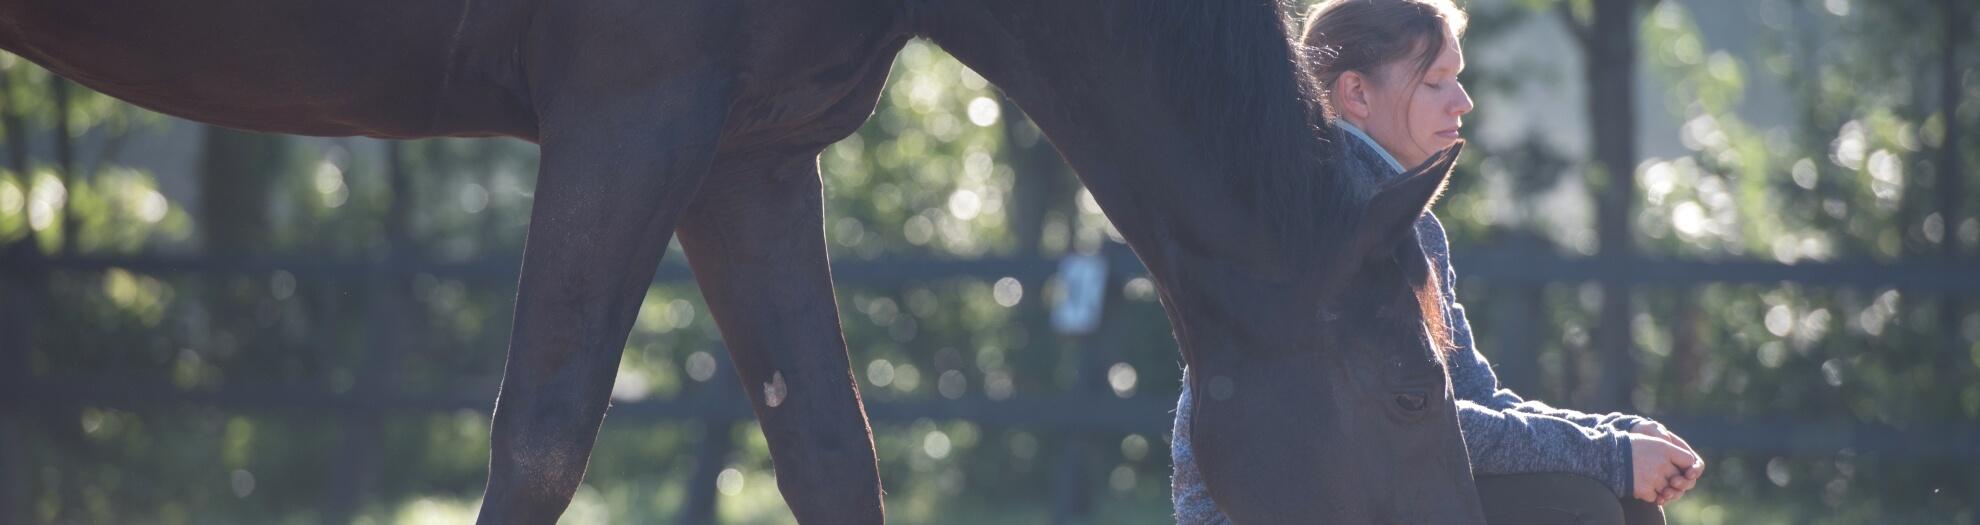 Ruitermeditatie - Horse Power Life Power